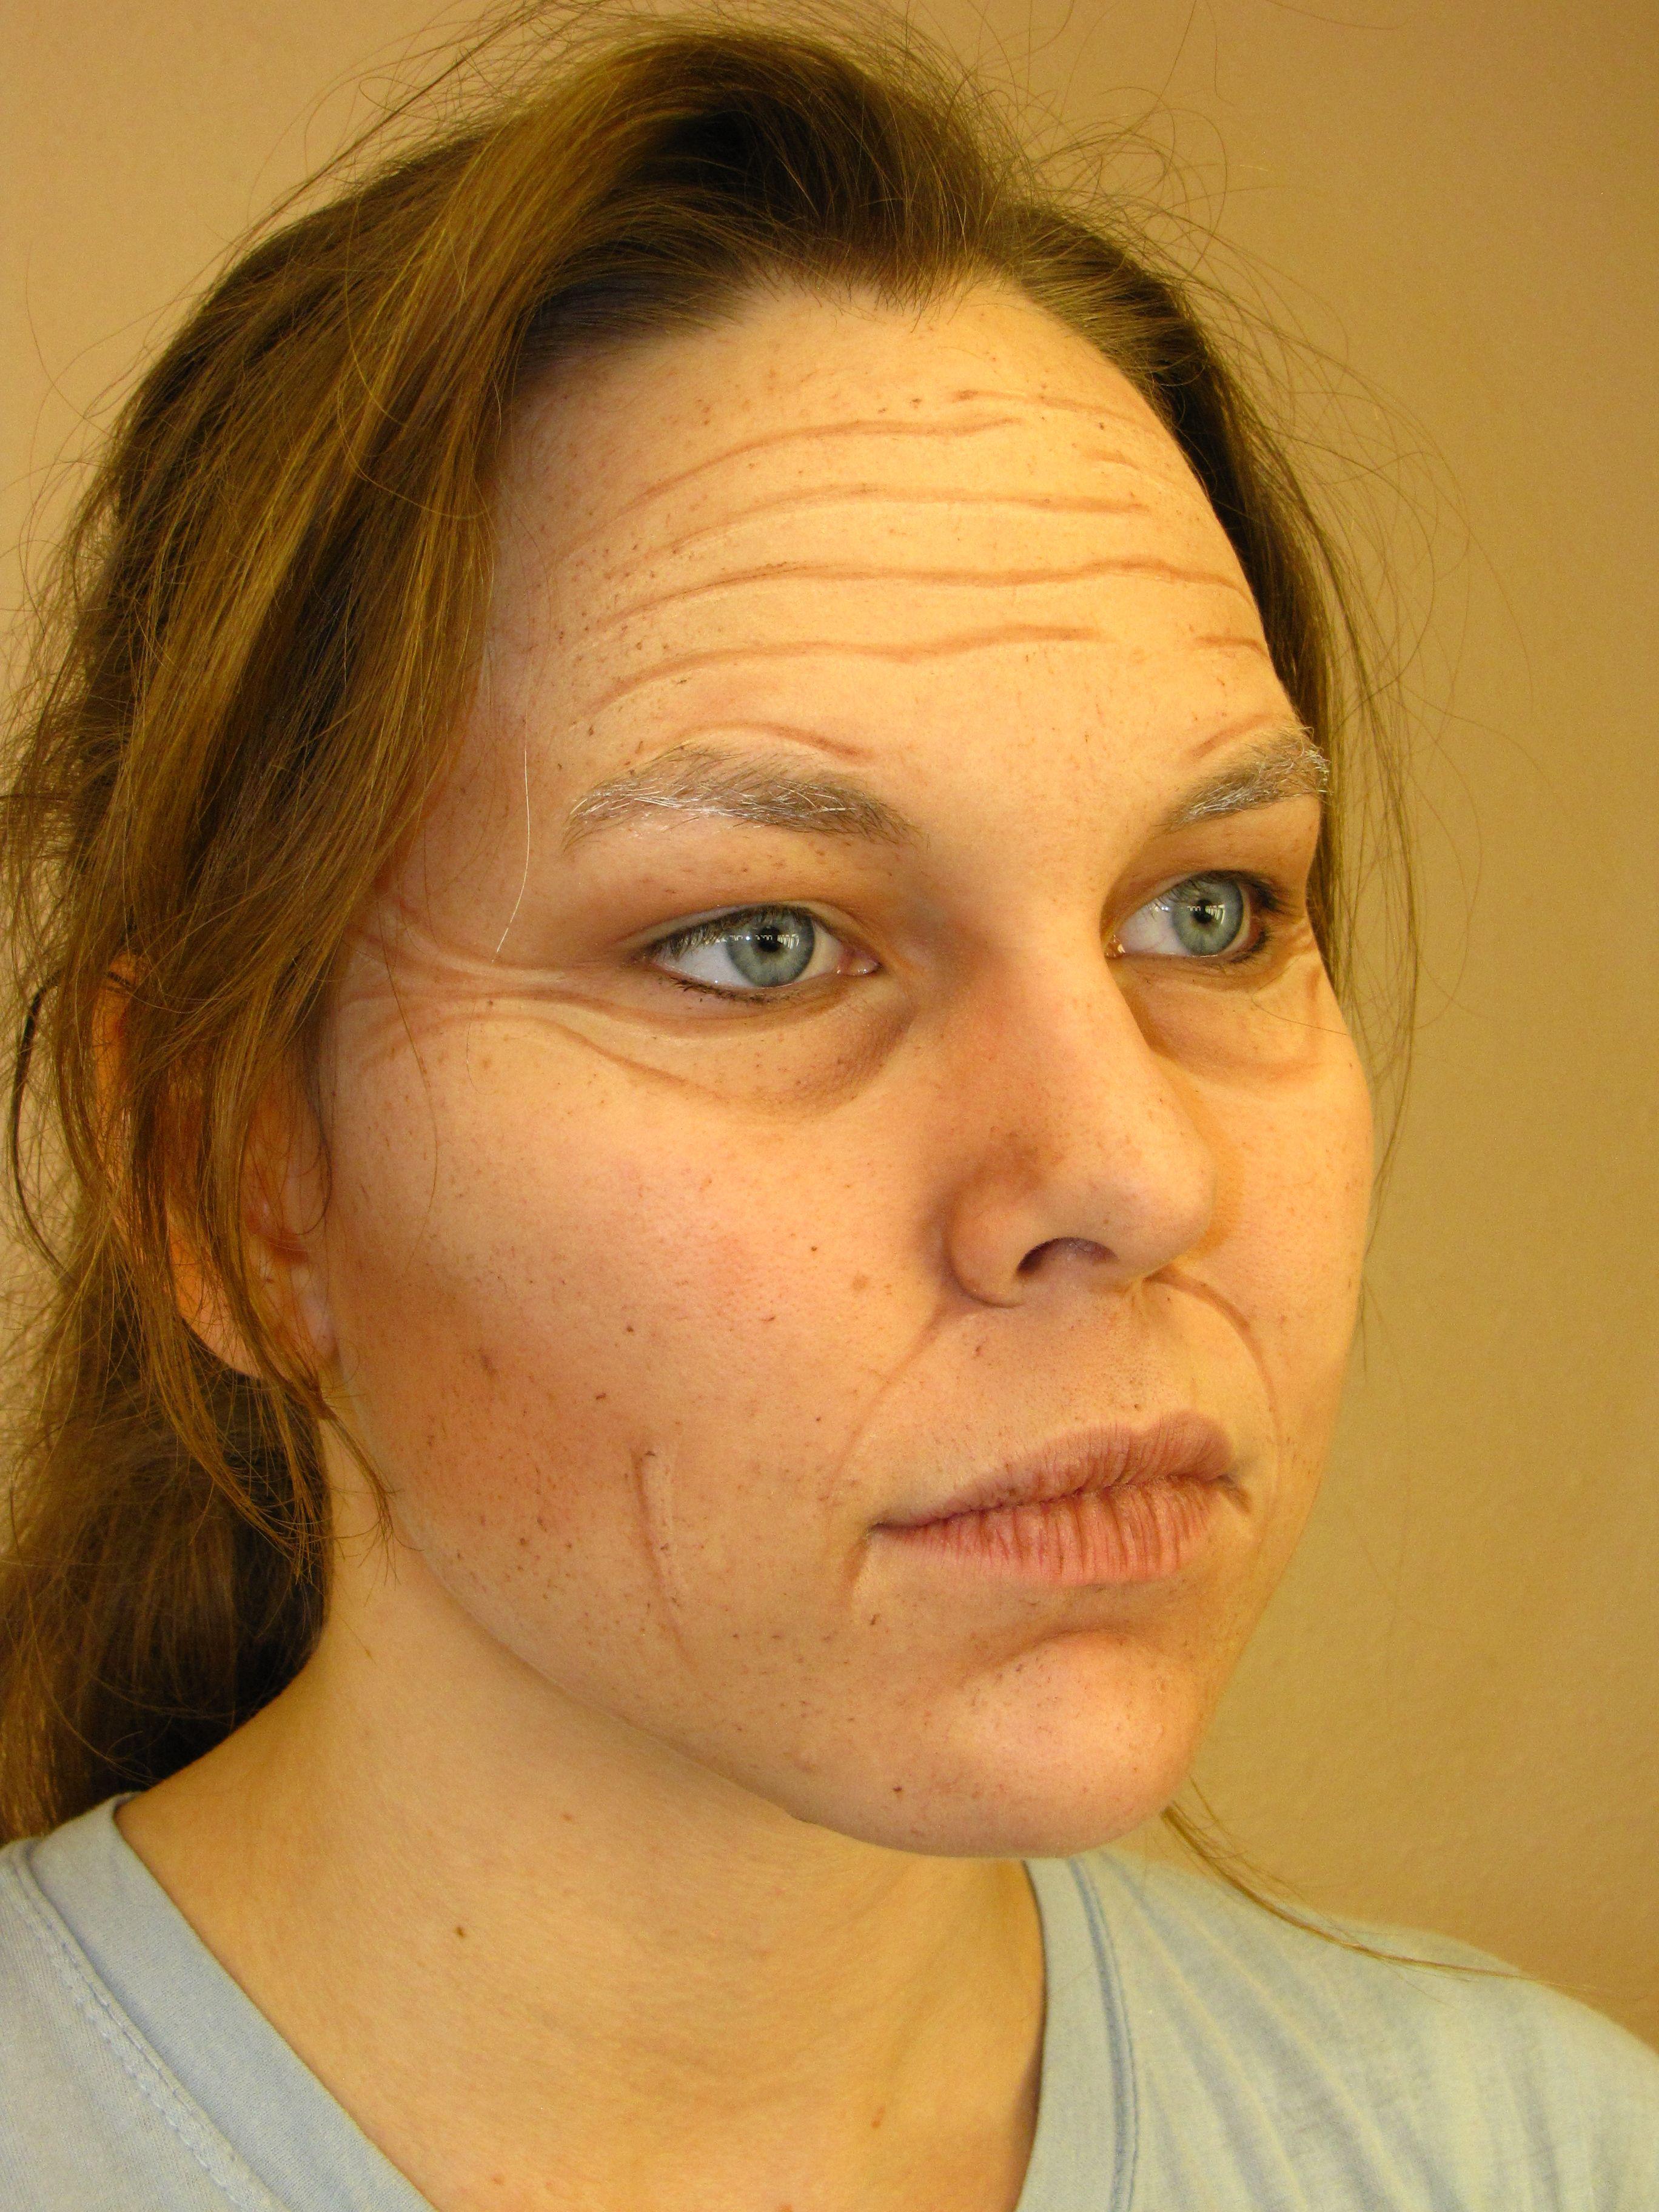 Extreme Old Age Makeup Test Use Ben Nye base, highlight